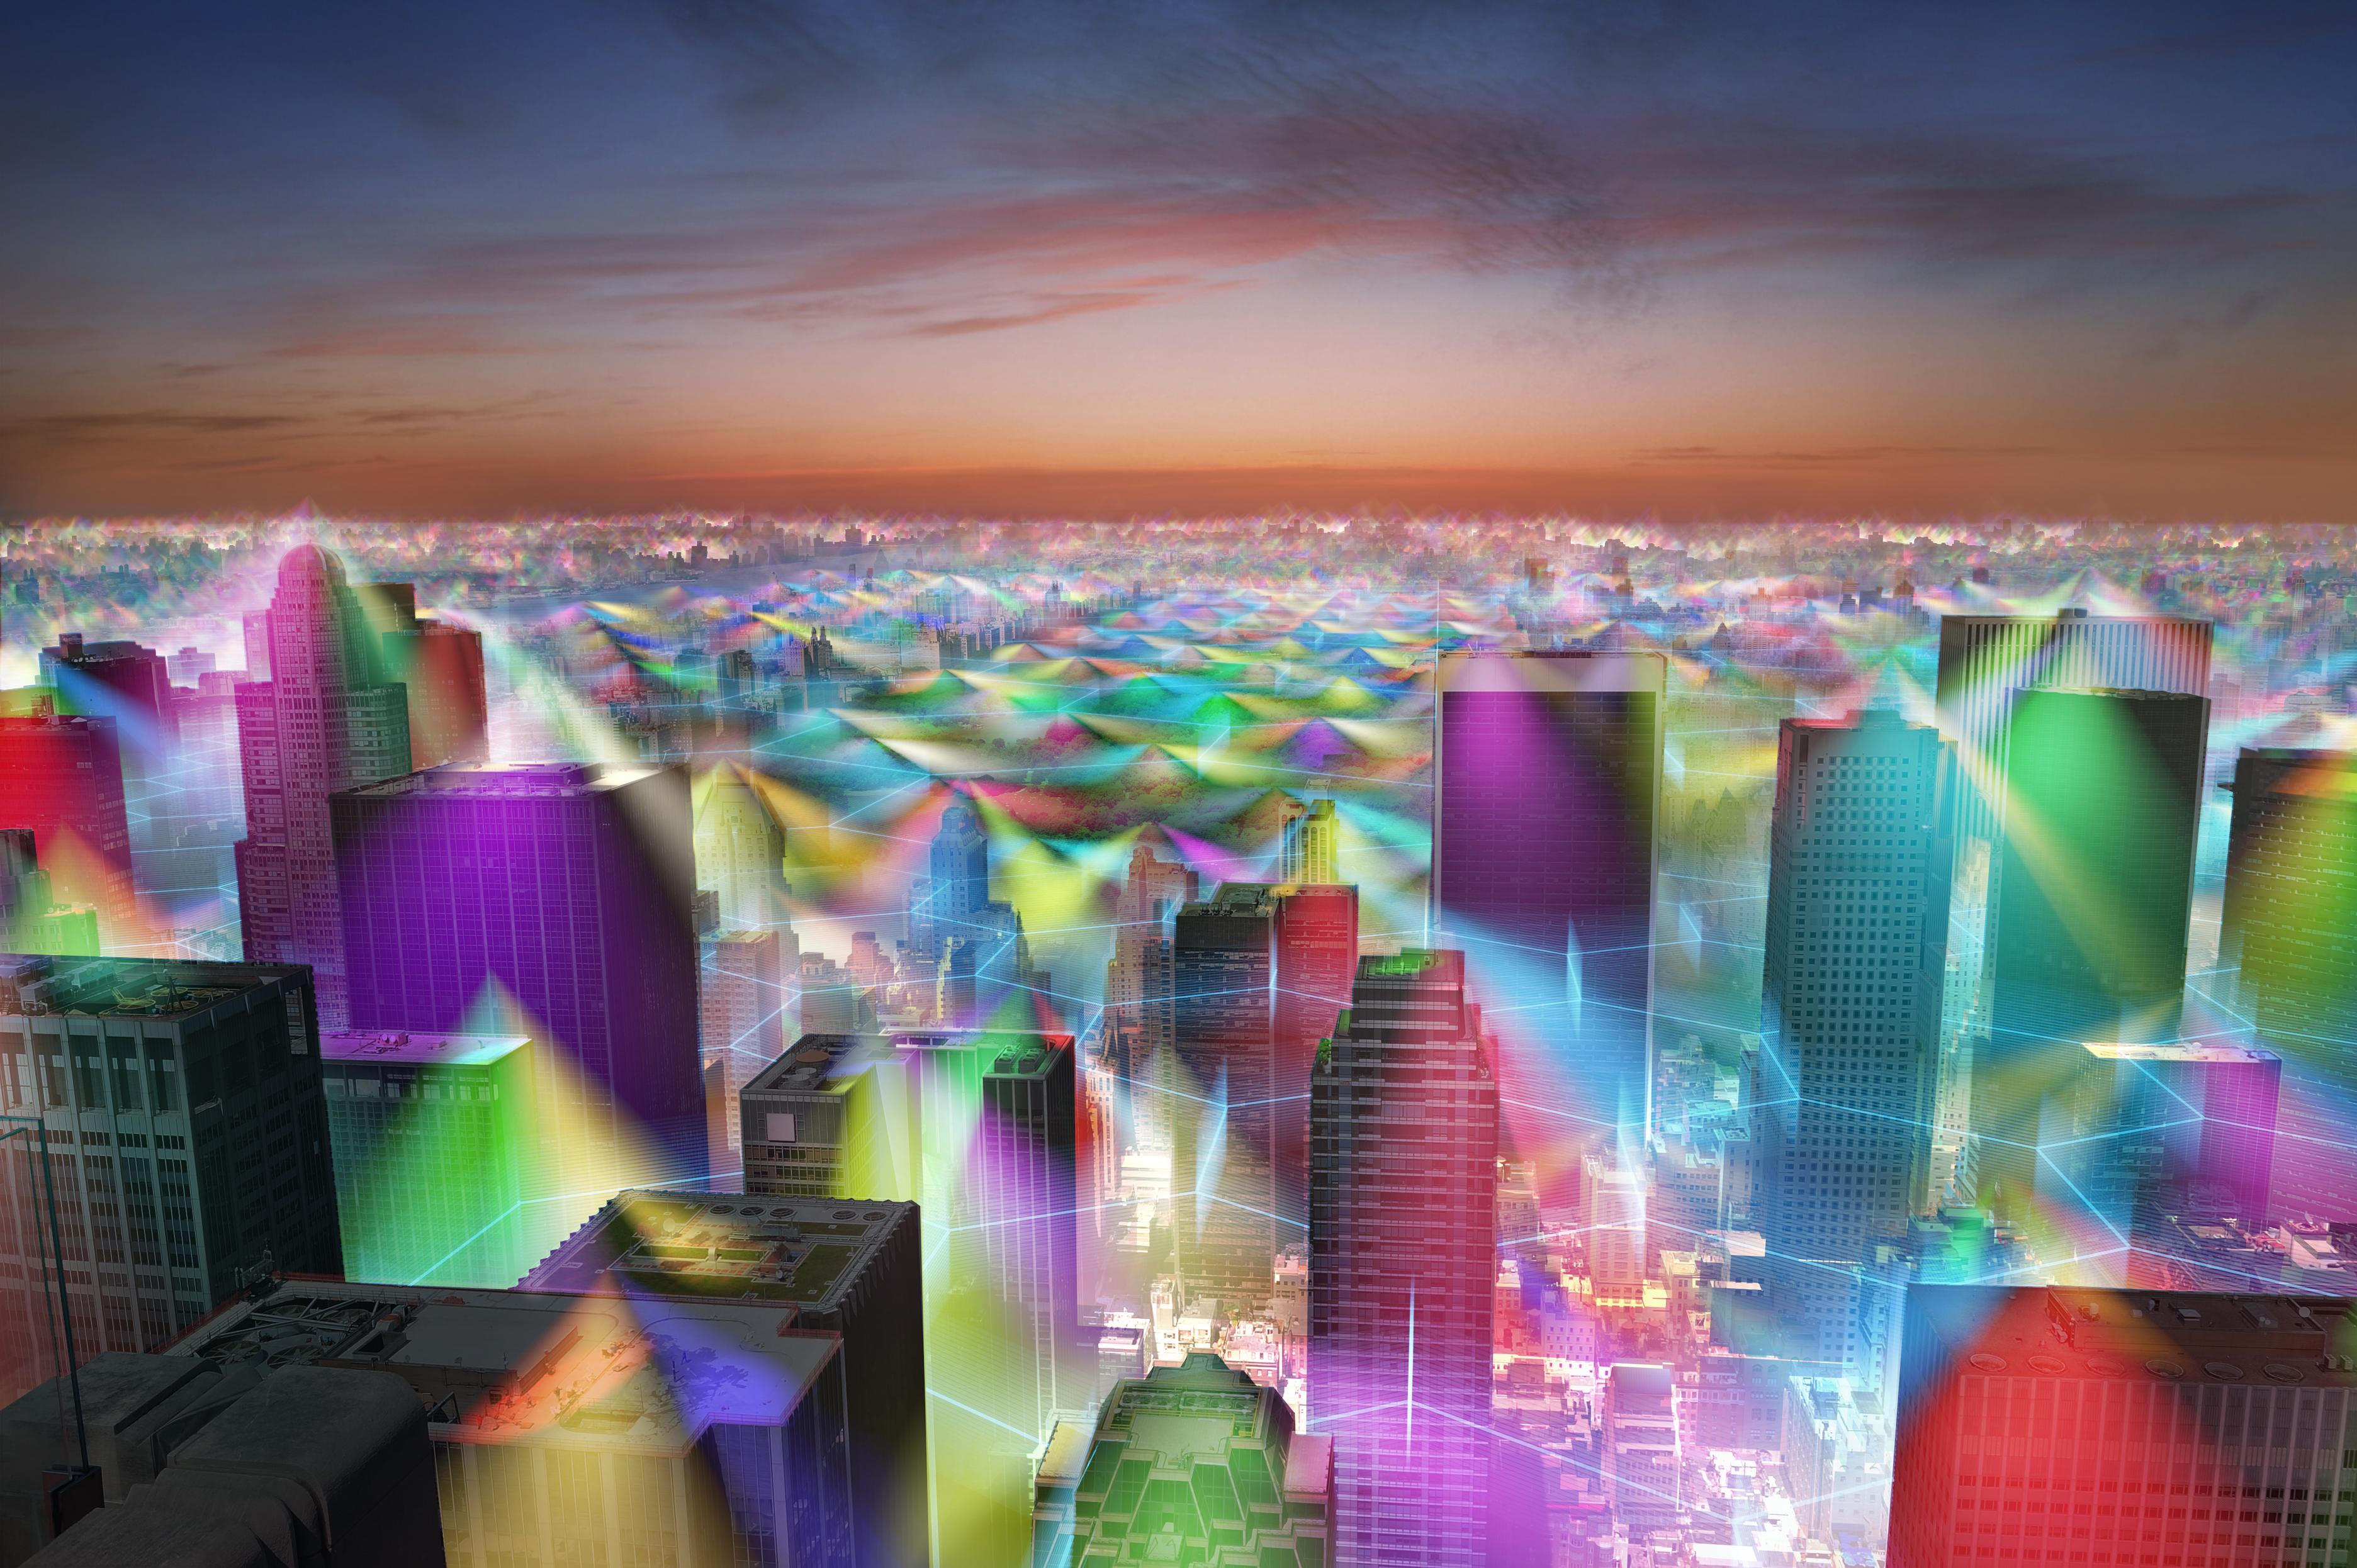 vizualizacia mikrovlnneho ziarenia